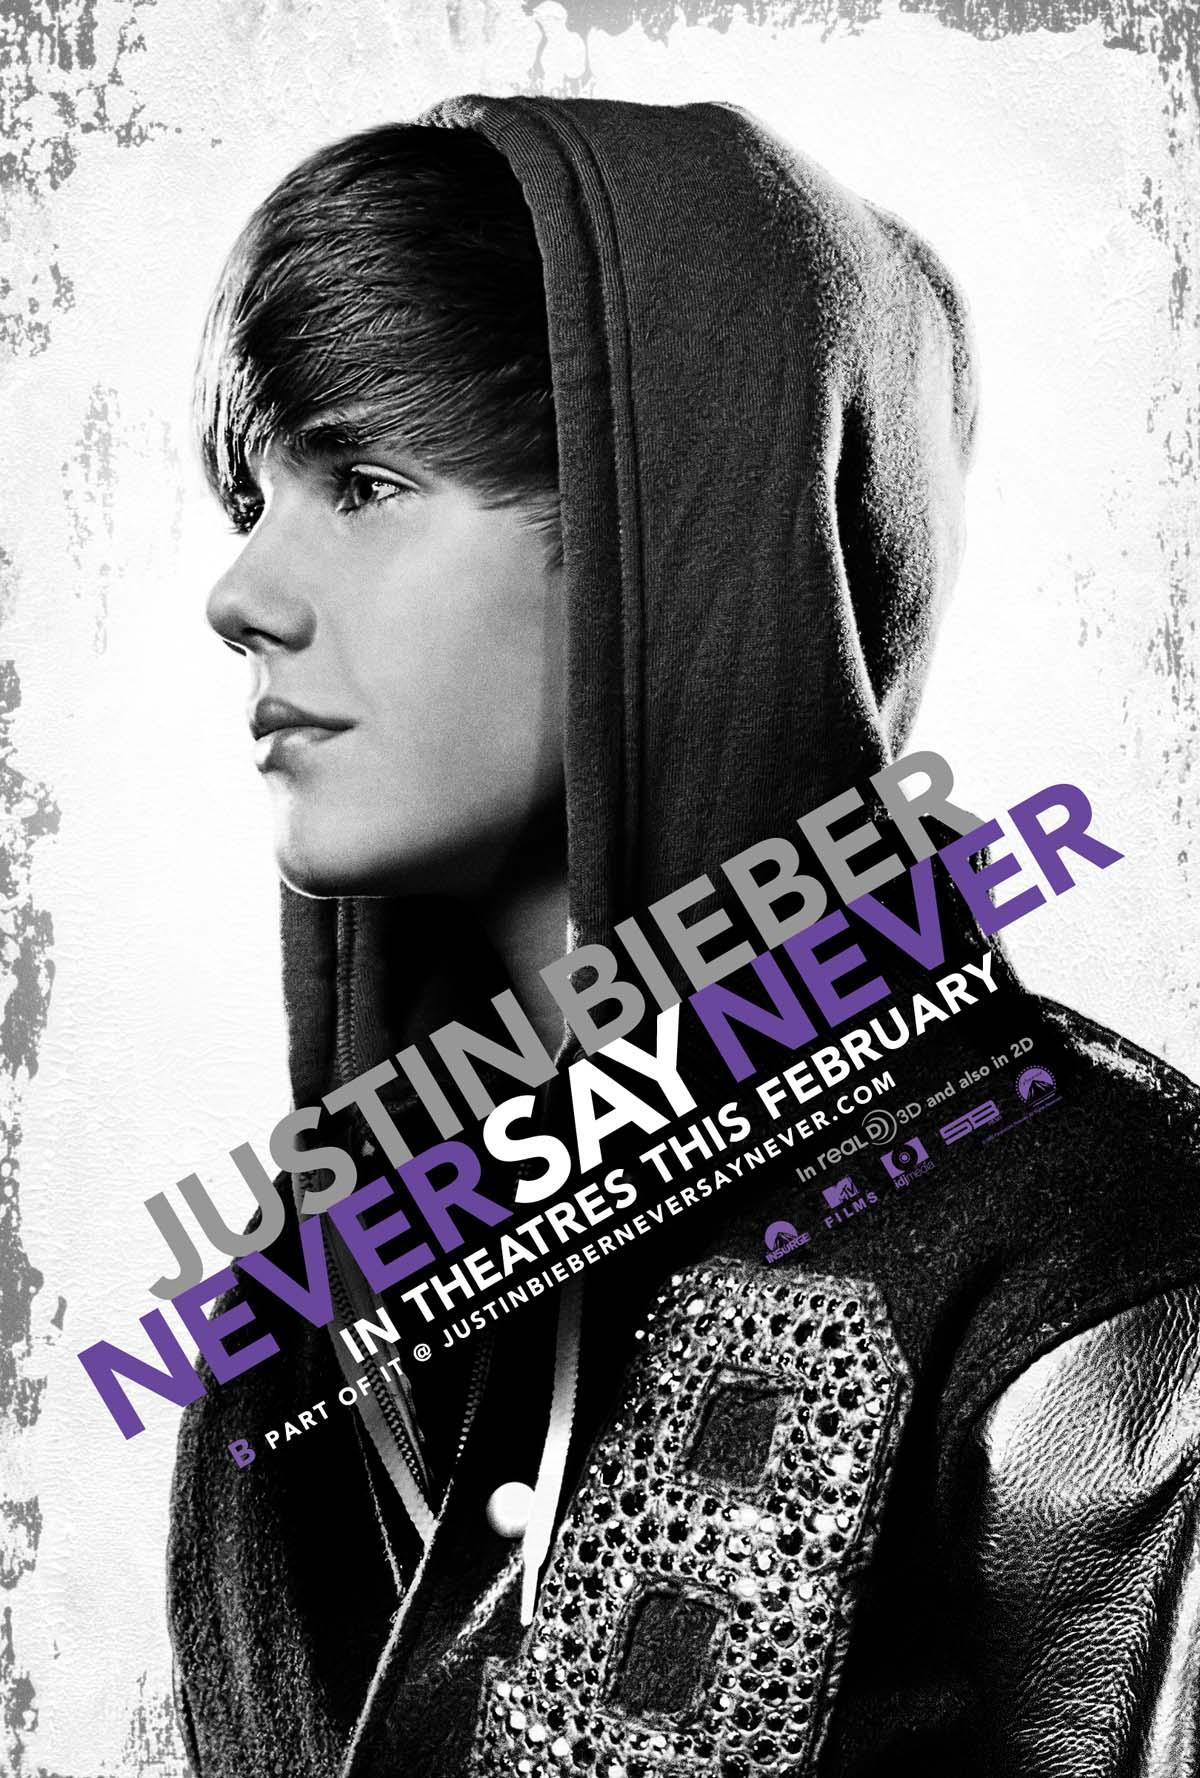 Justin Bieber Never Say Never.jpeg